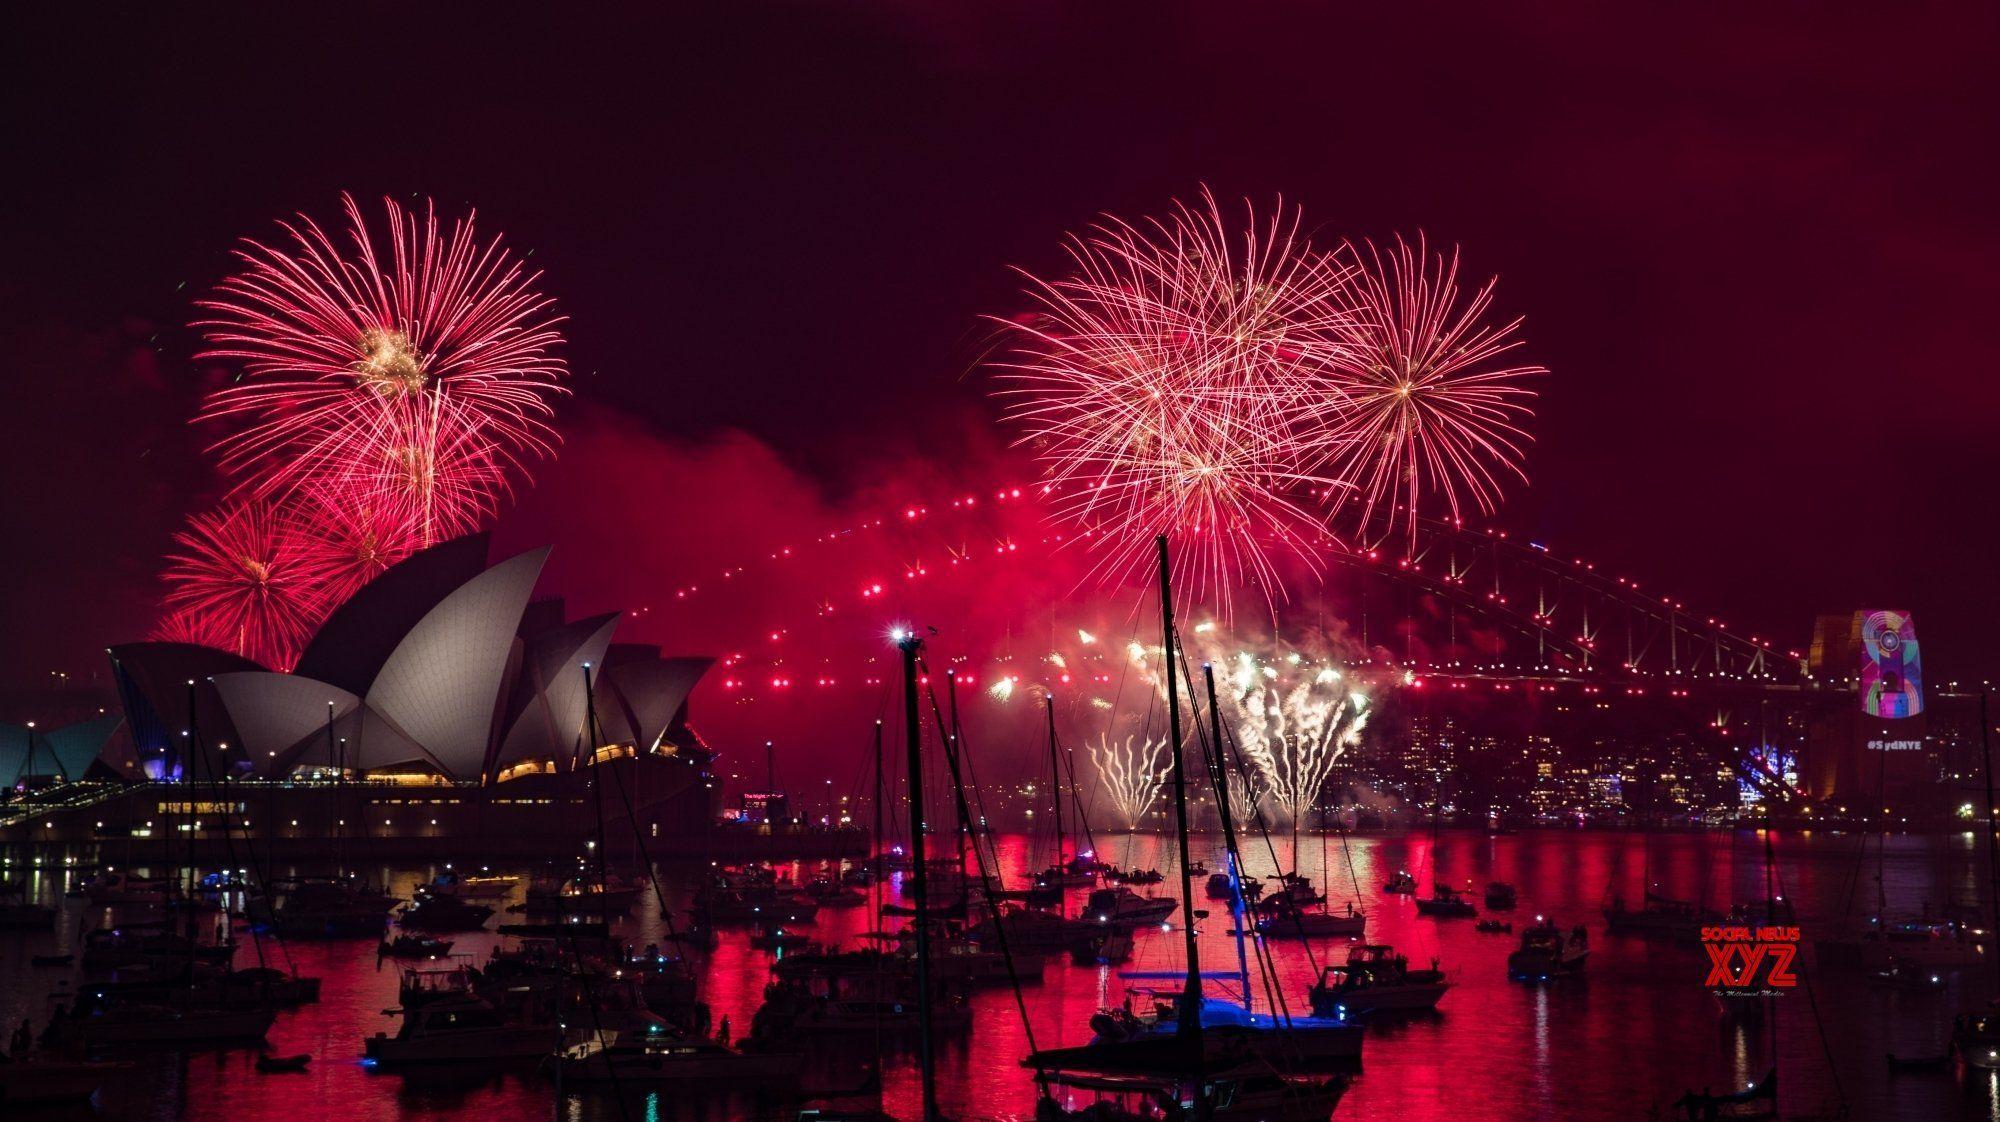 Australia Sydney New Year Eve Firework Gallery Social News Xyz New Years Eve Fireworks Fireworks New Years Eve